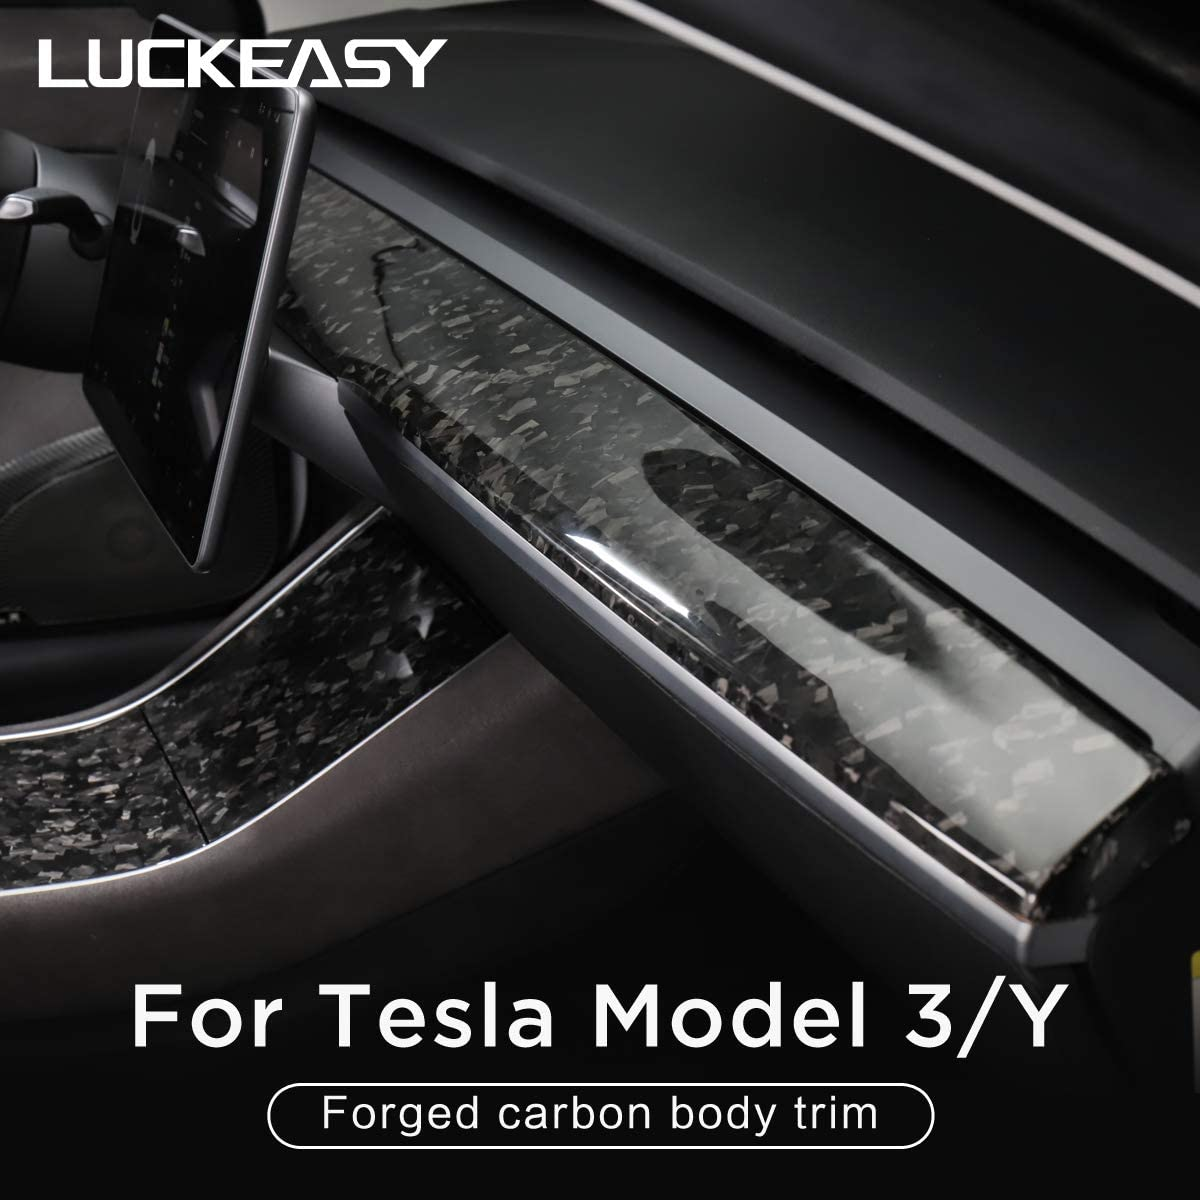 CA M3-CF23L LUCKEASY Car Interior Exterior Accessories For Tesla Model 3 Real Carbon FIber Modification kits